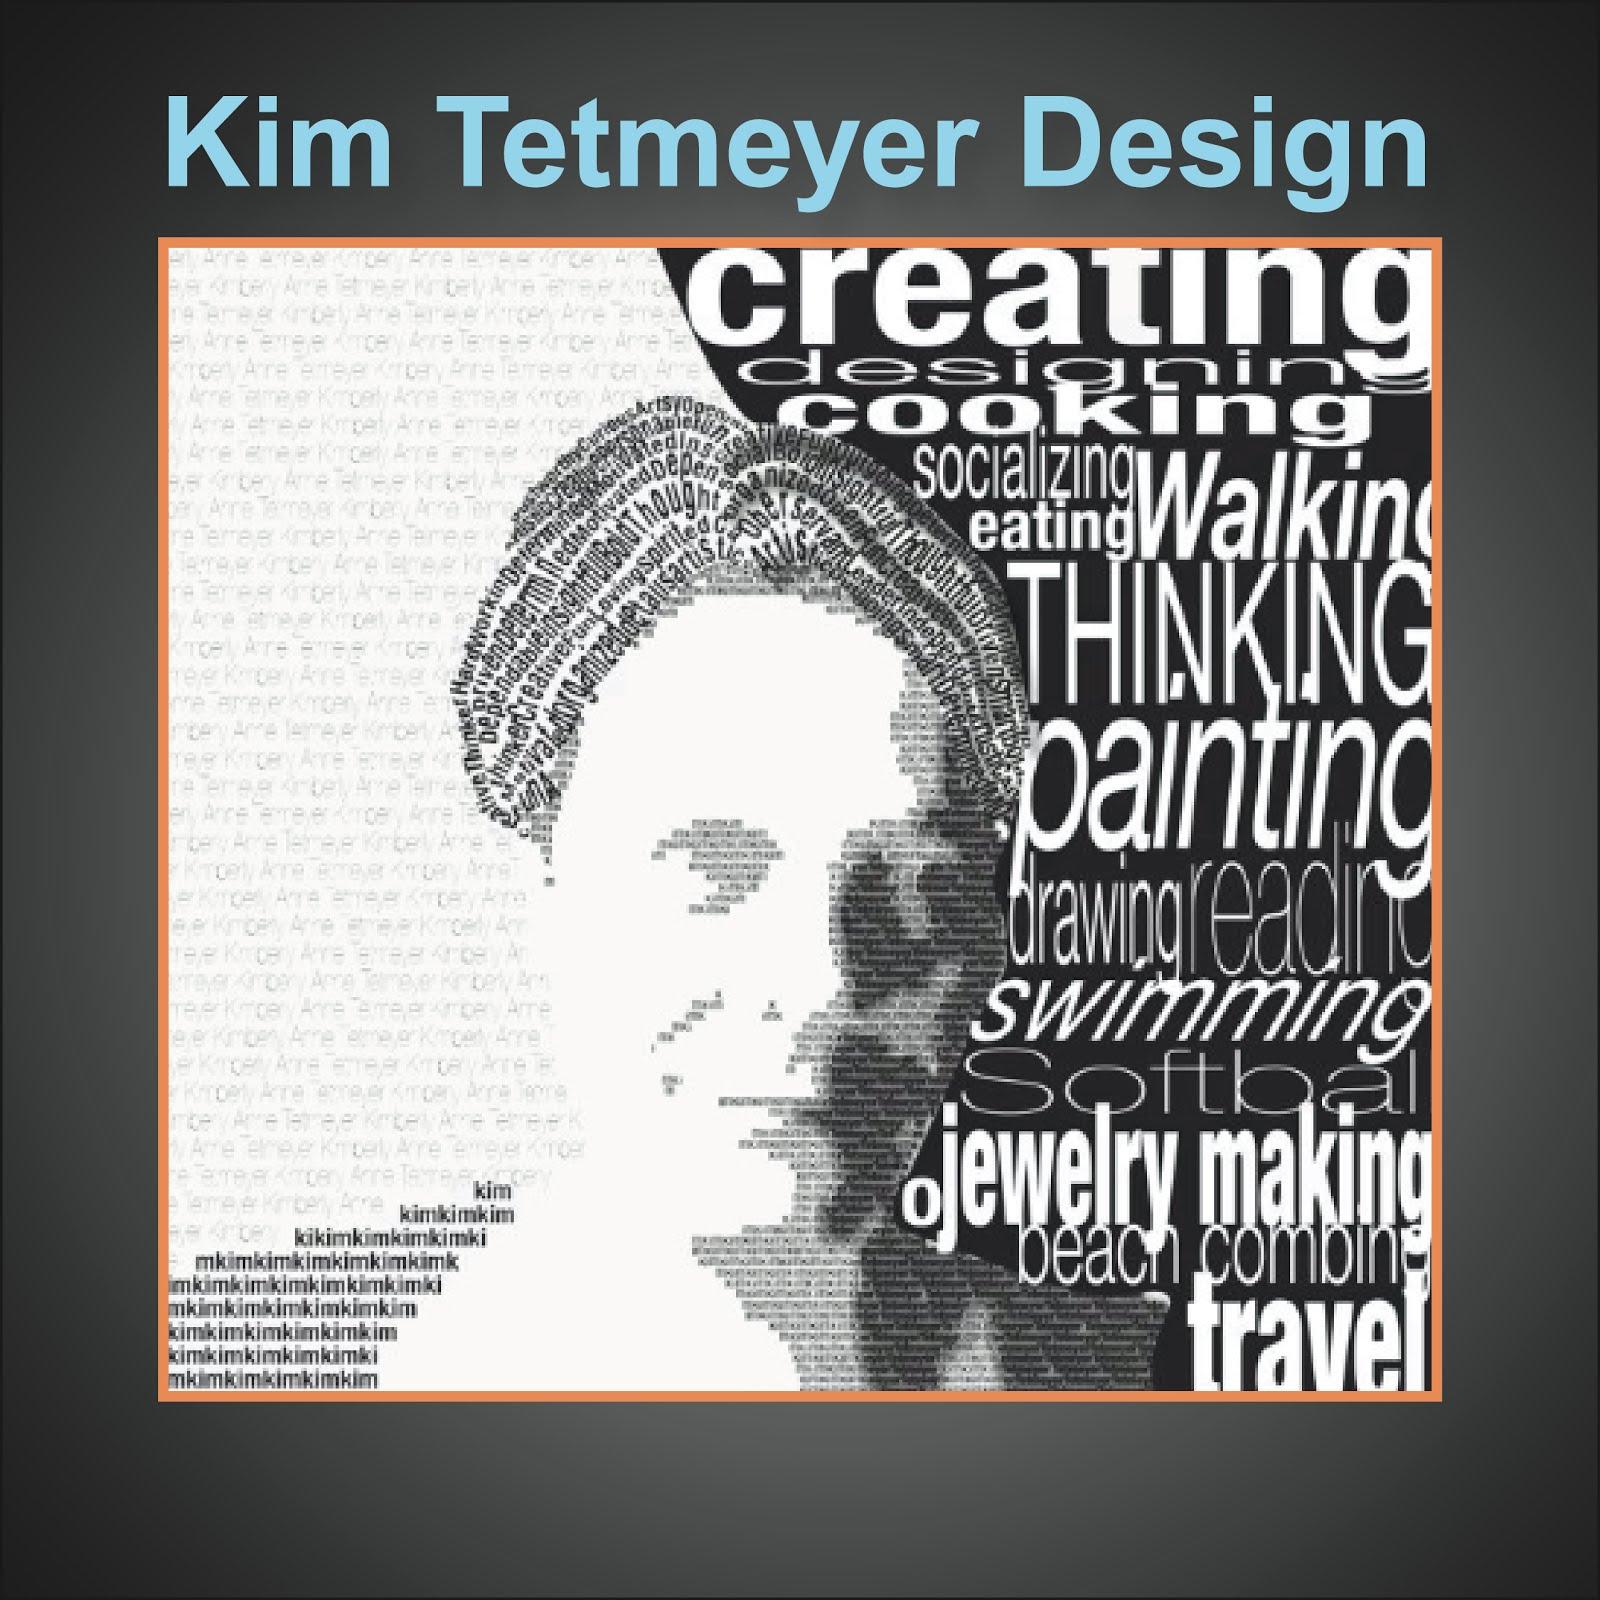 Kim Tetmeyer Design